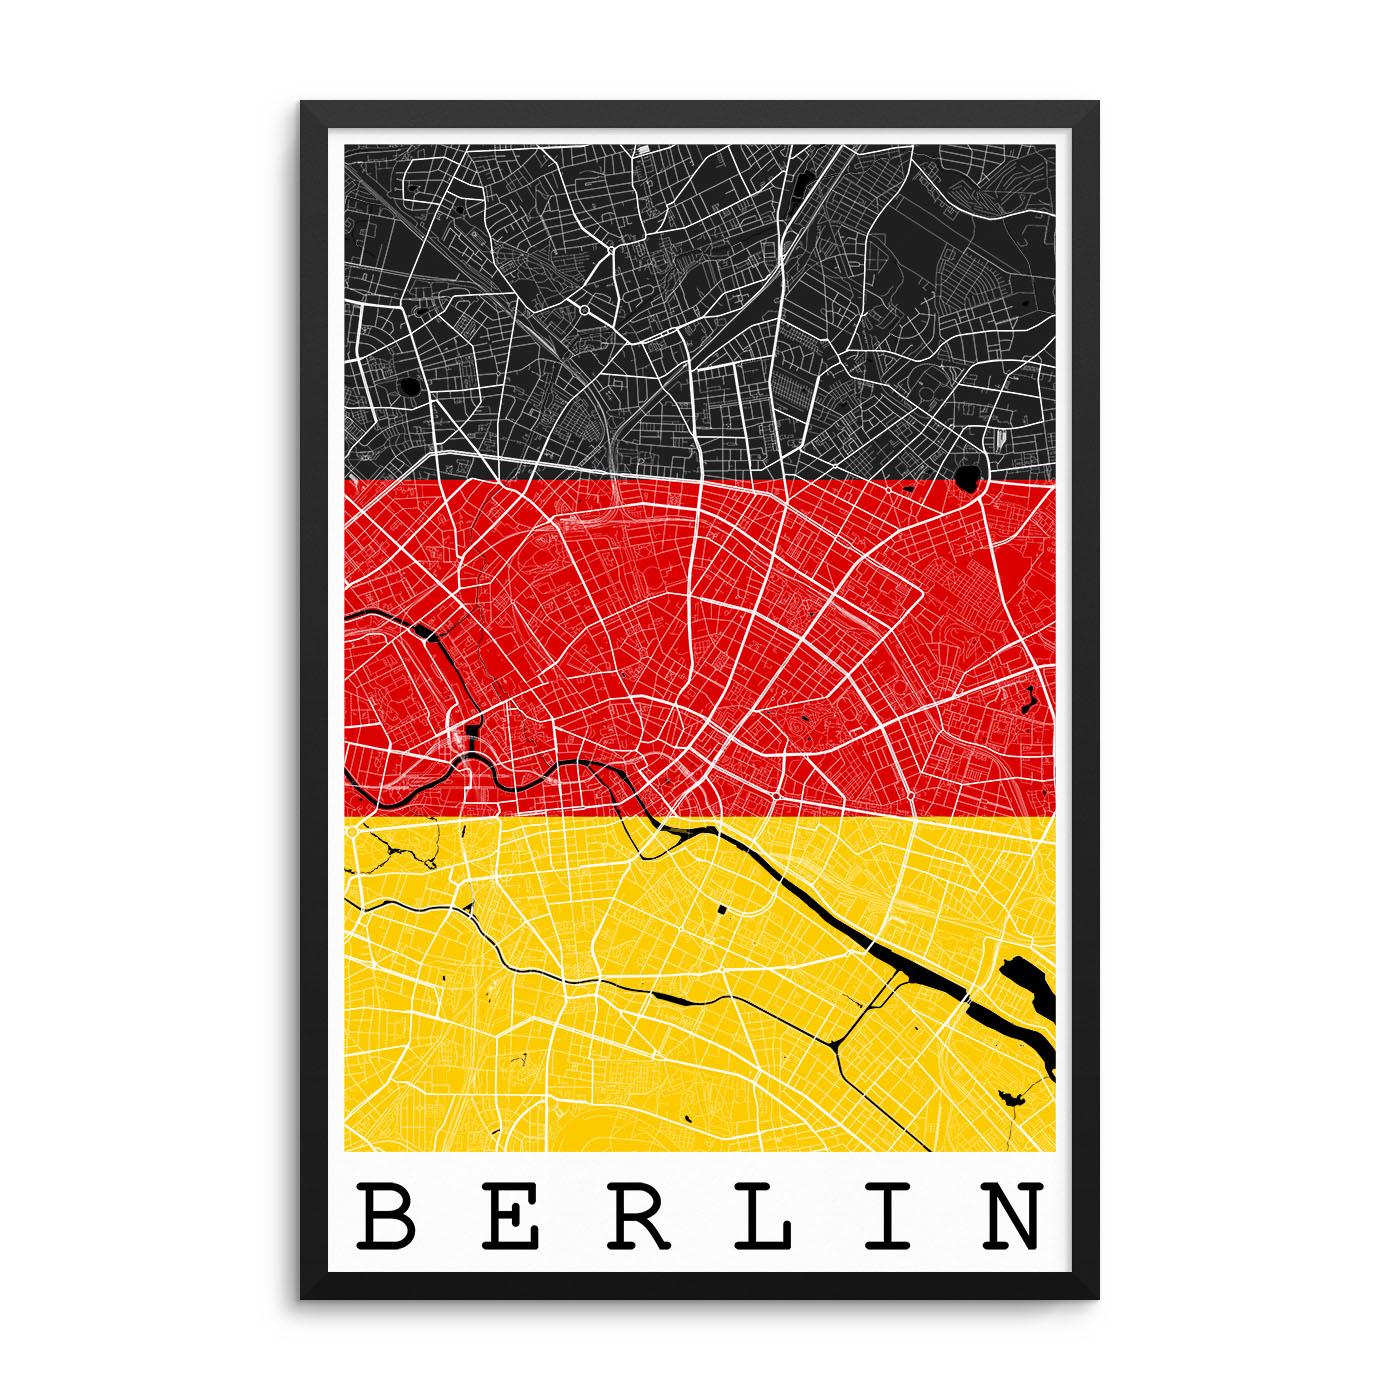 Berlin Germany Flag Map Poster on albania flag map, australia flag map, ukraine flag map, italy flag map, kuwait flag map, american flag map, india flag map, canada flag map, finland flag map, sweden flag map, mexico flag map, france flag map, portugal flag map, russia flag map, south korea flag map, china flag map, netherlands flag map, hawaii flag map, ireland flag map, german flag states map,